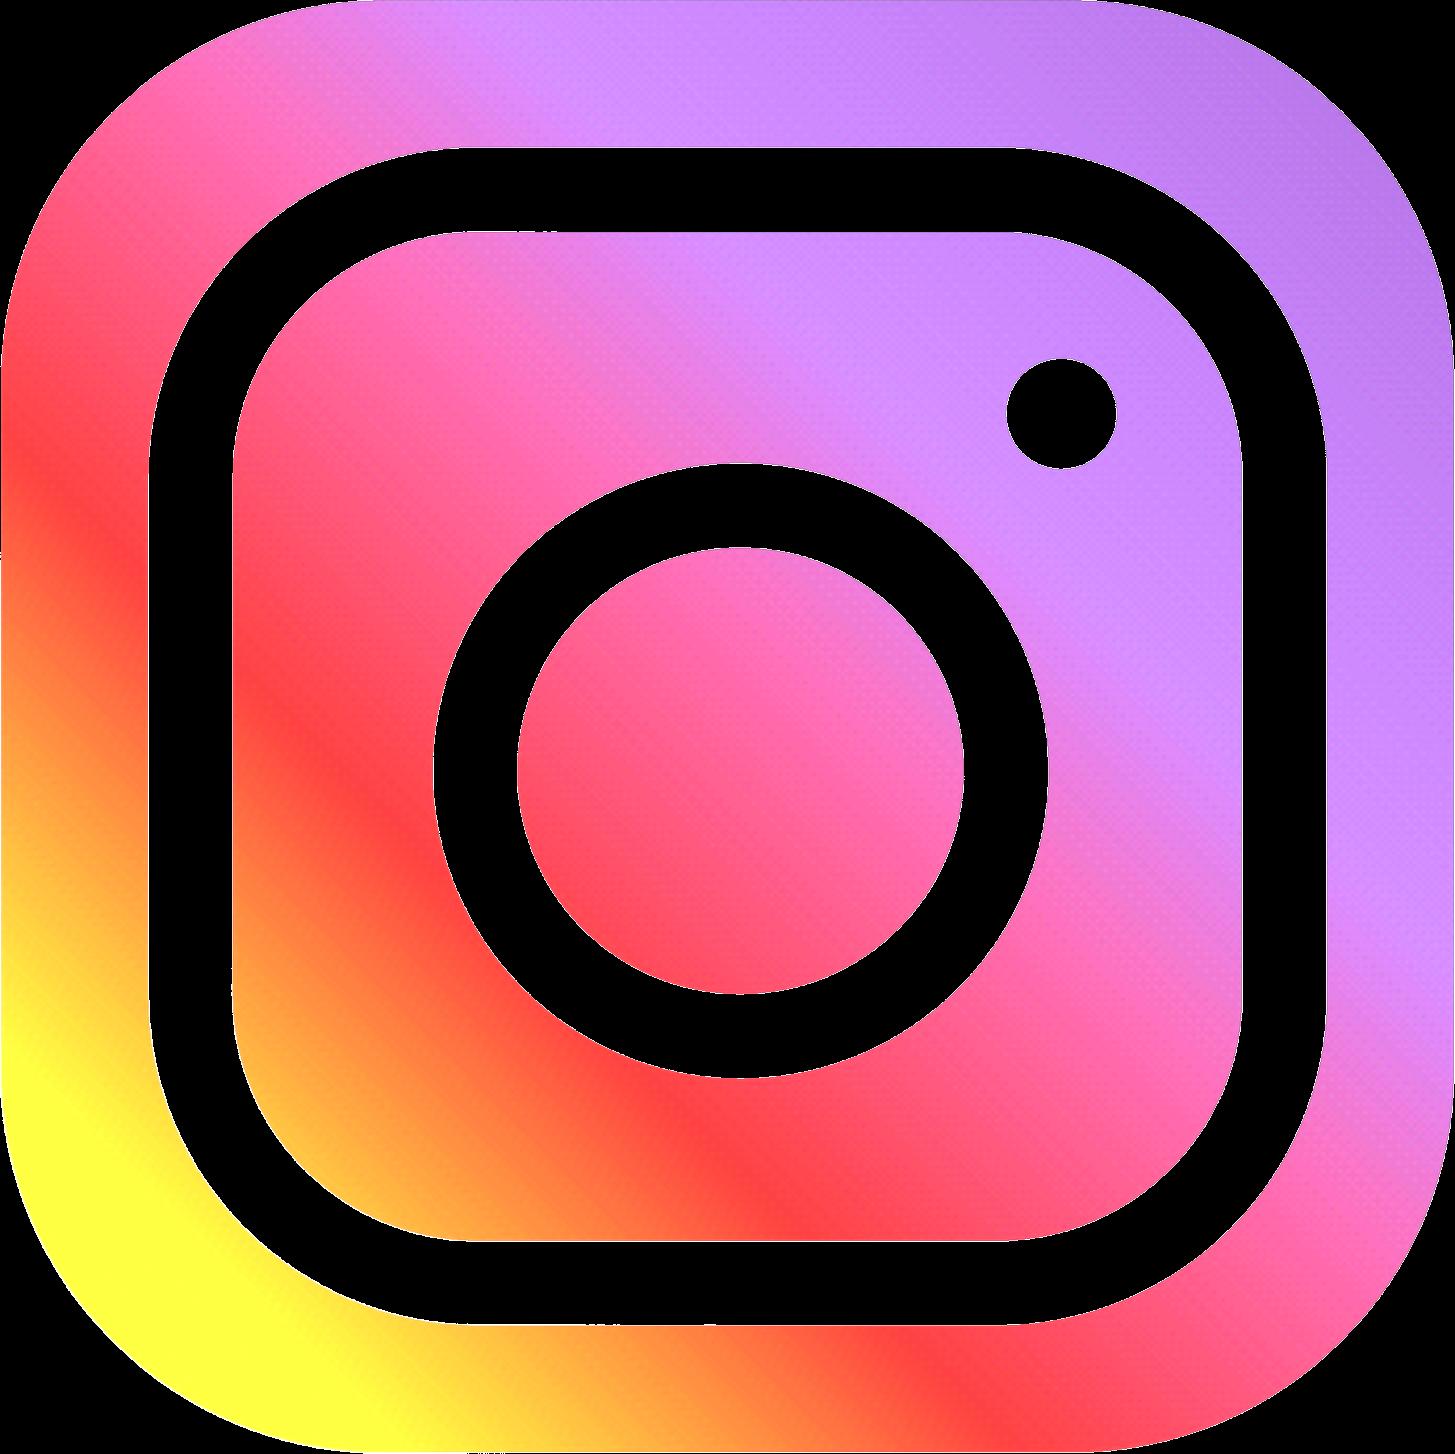 Acubens on Instagram